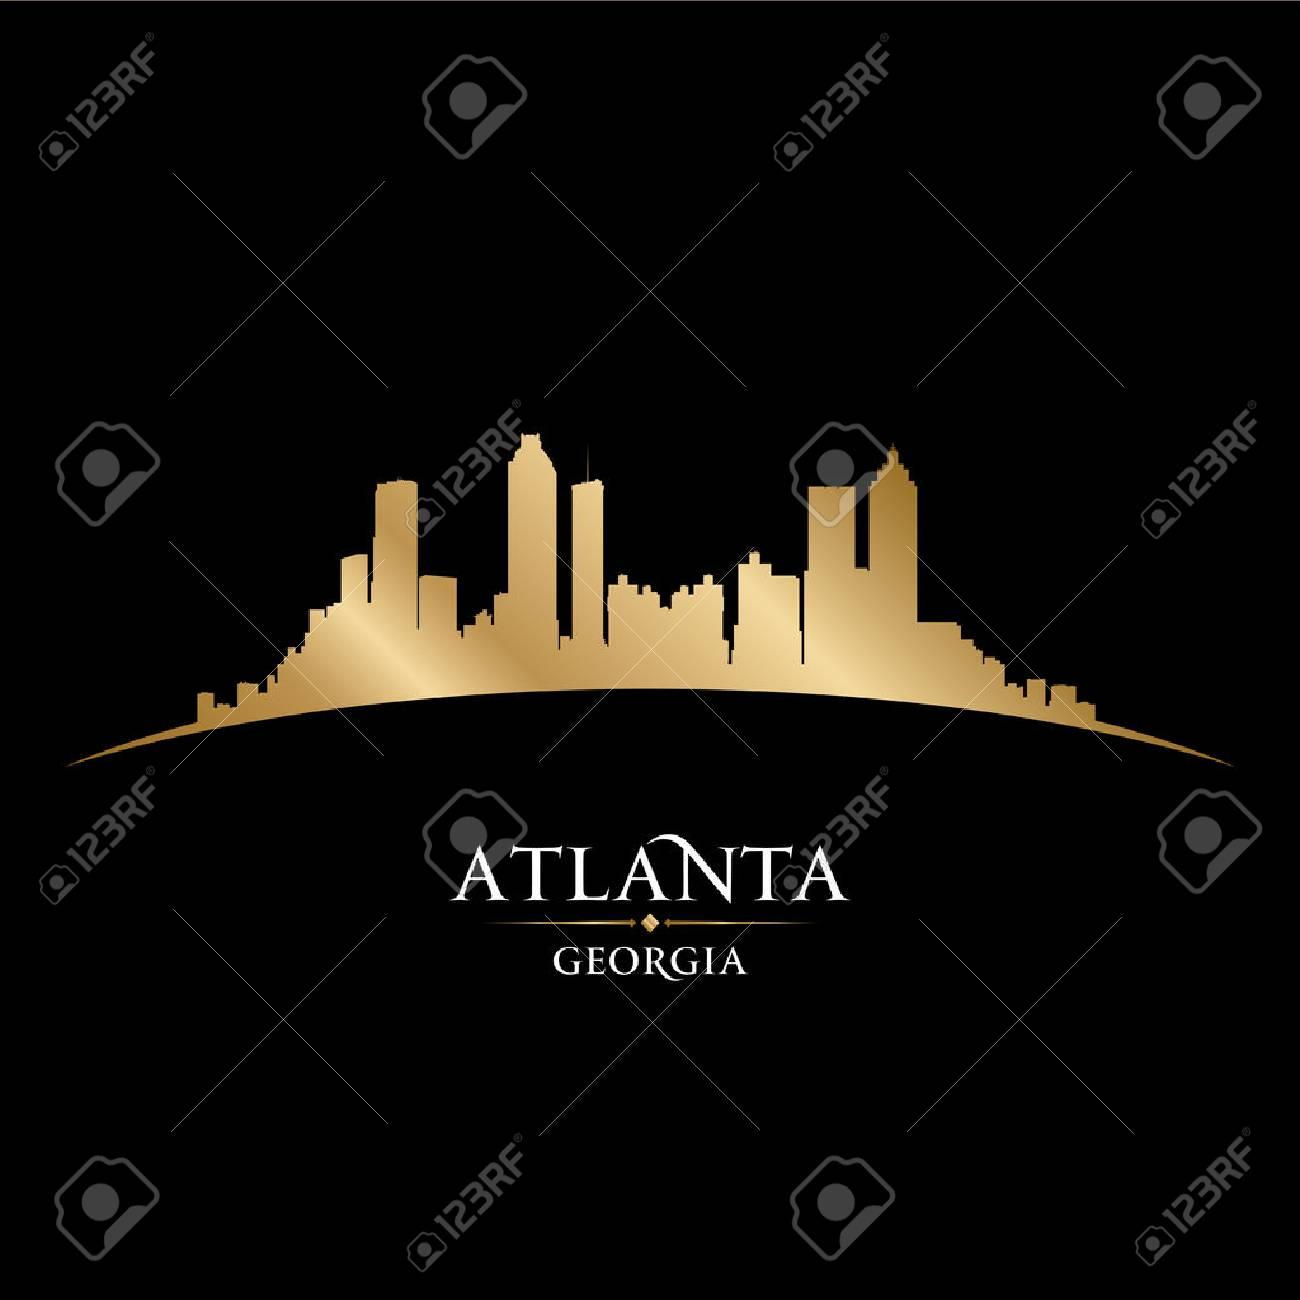 Atlanta Georgia city skyline silhouette  Vector illustration Stock Vector - 22726455